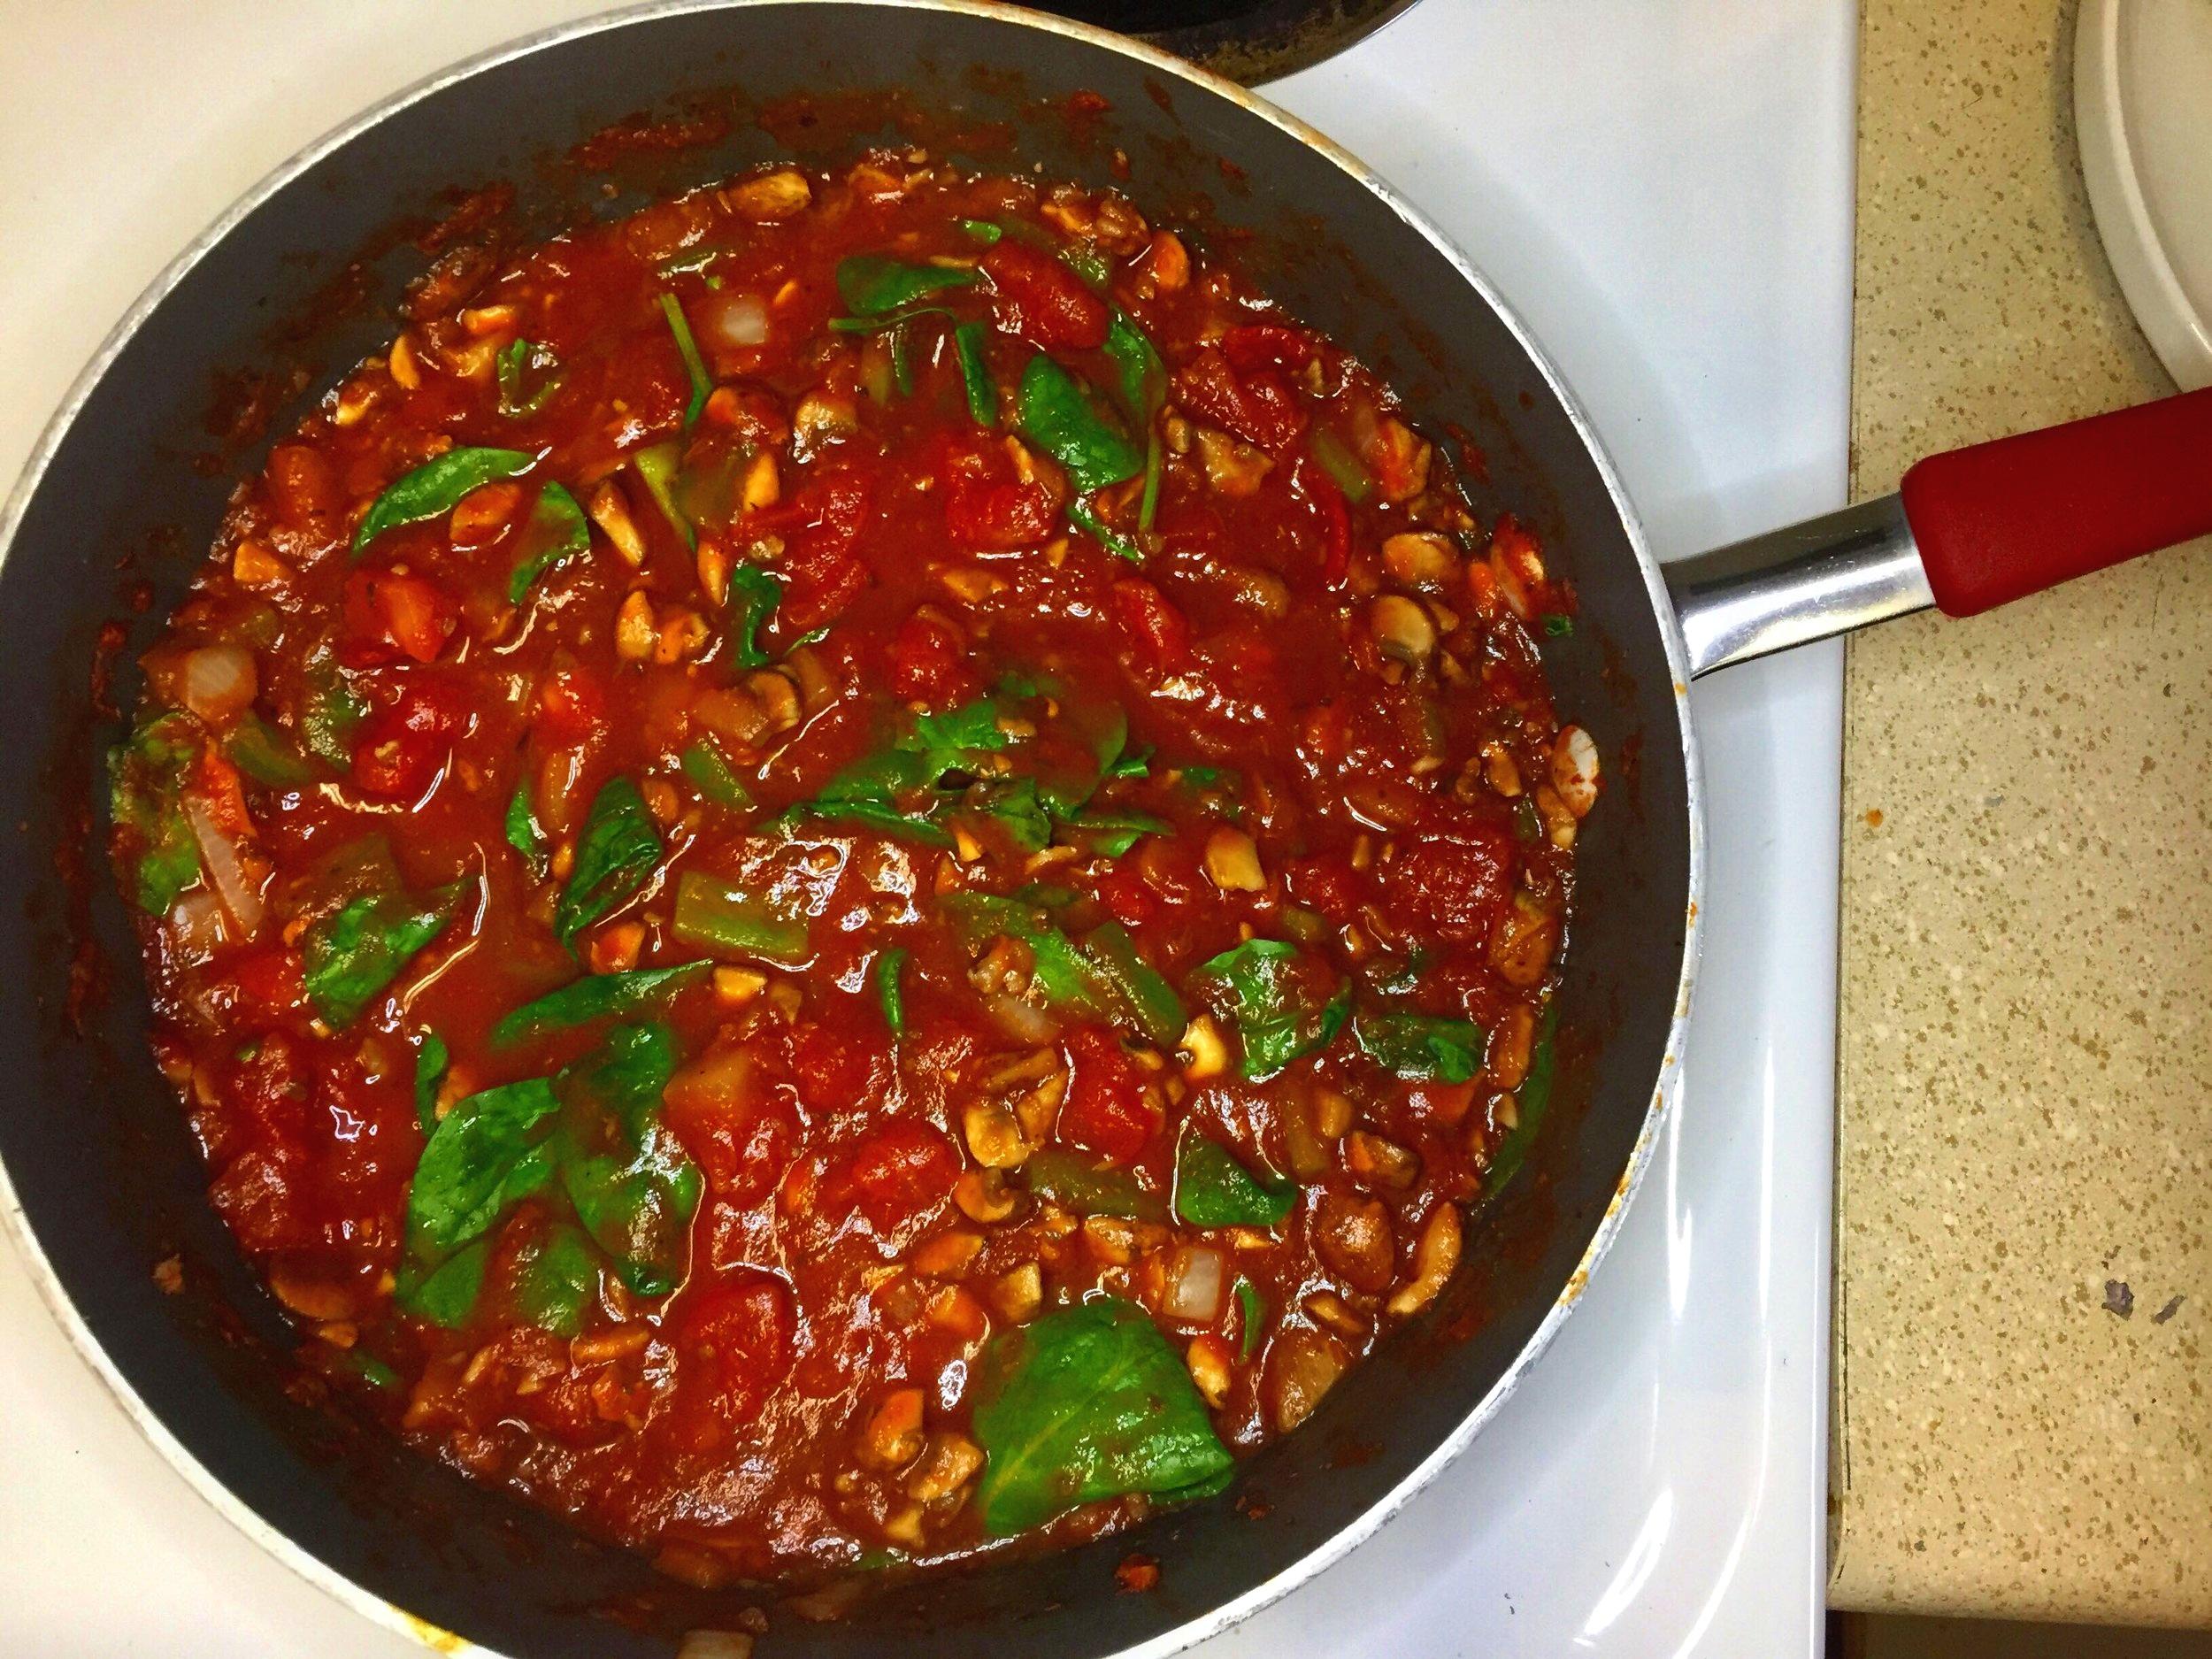 Lasagna+cooking.jpg